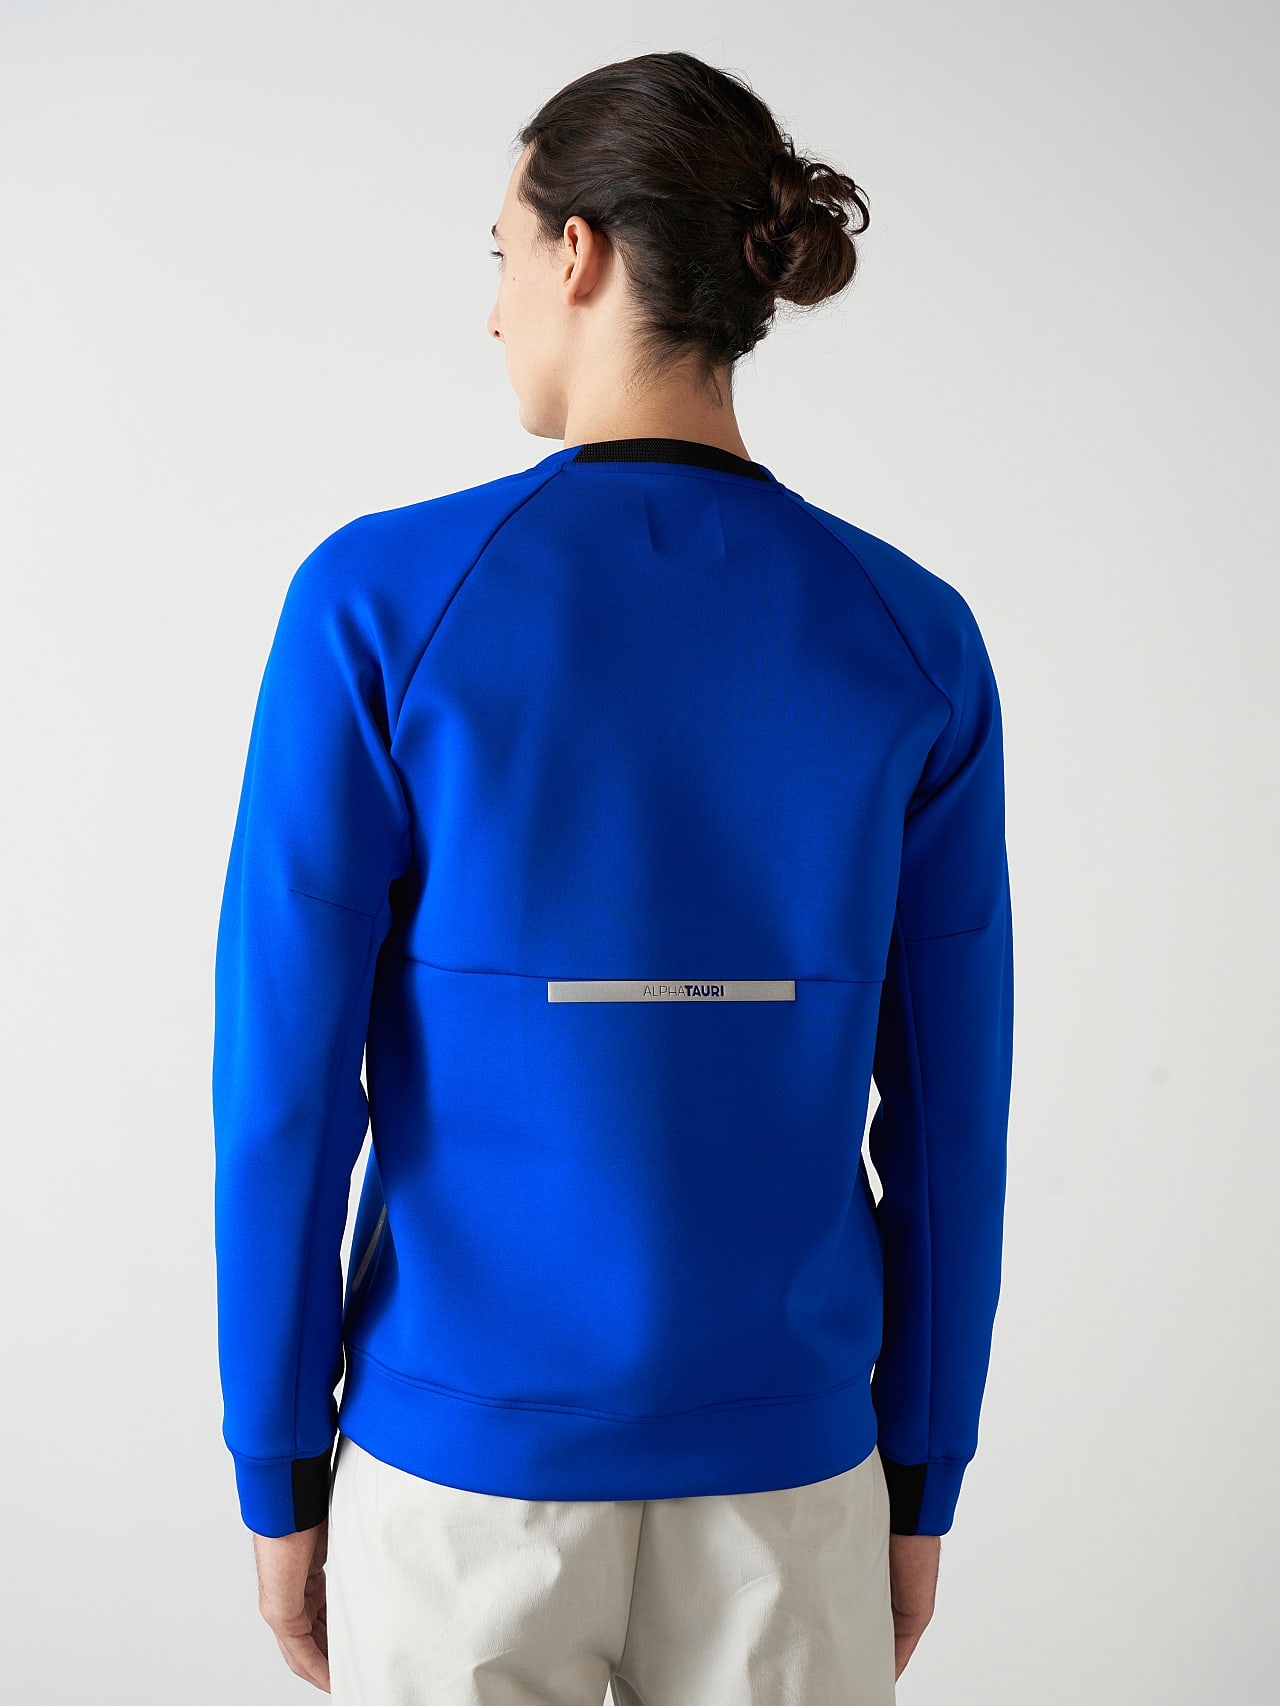 SUPRA V3.Y5.01 Technical Crewneck Sweater blue Front Main Alpha Tauri